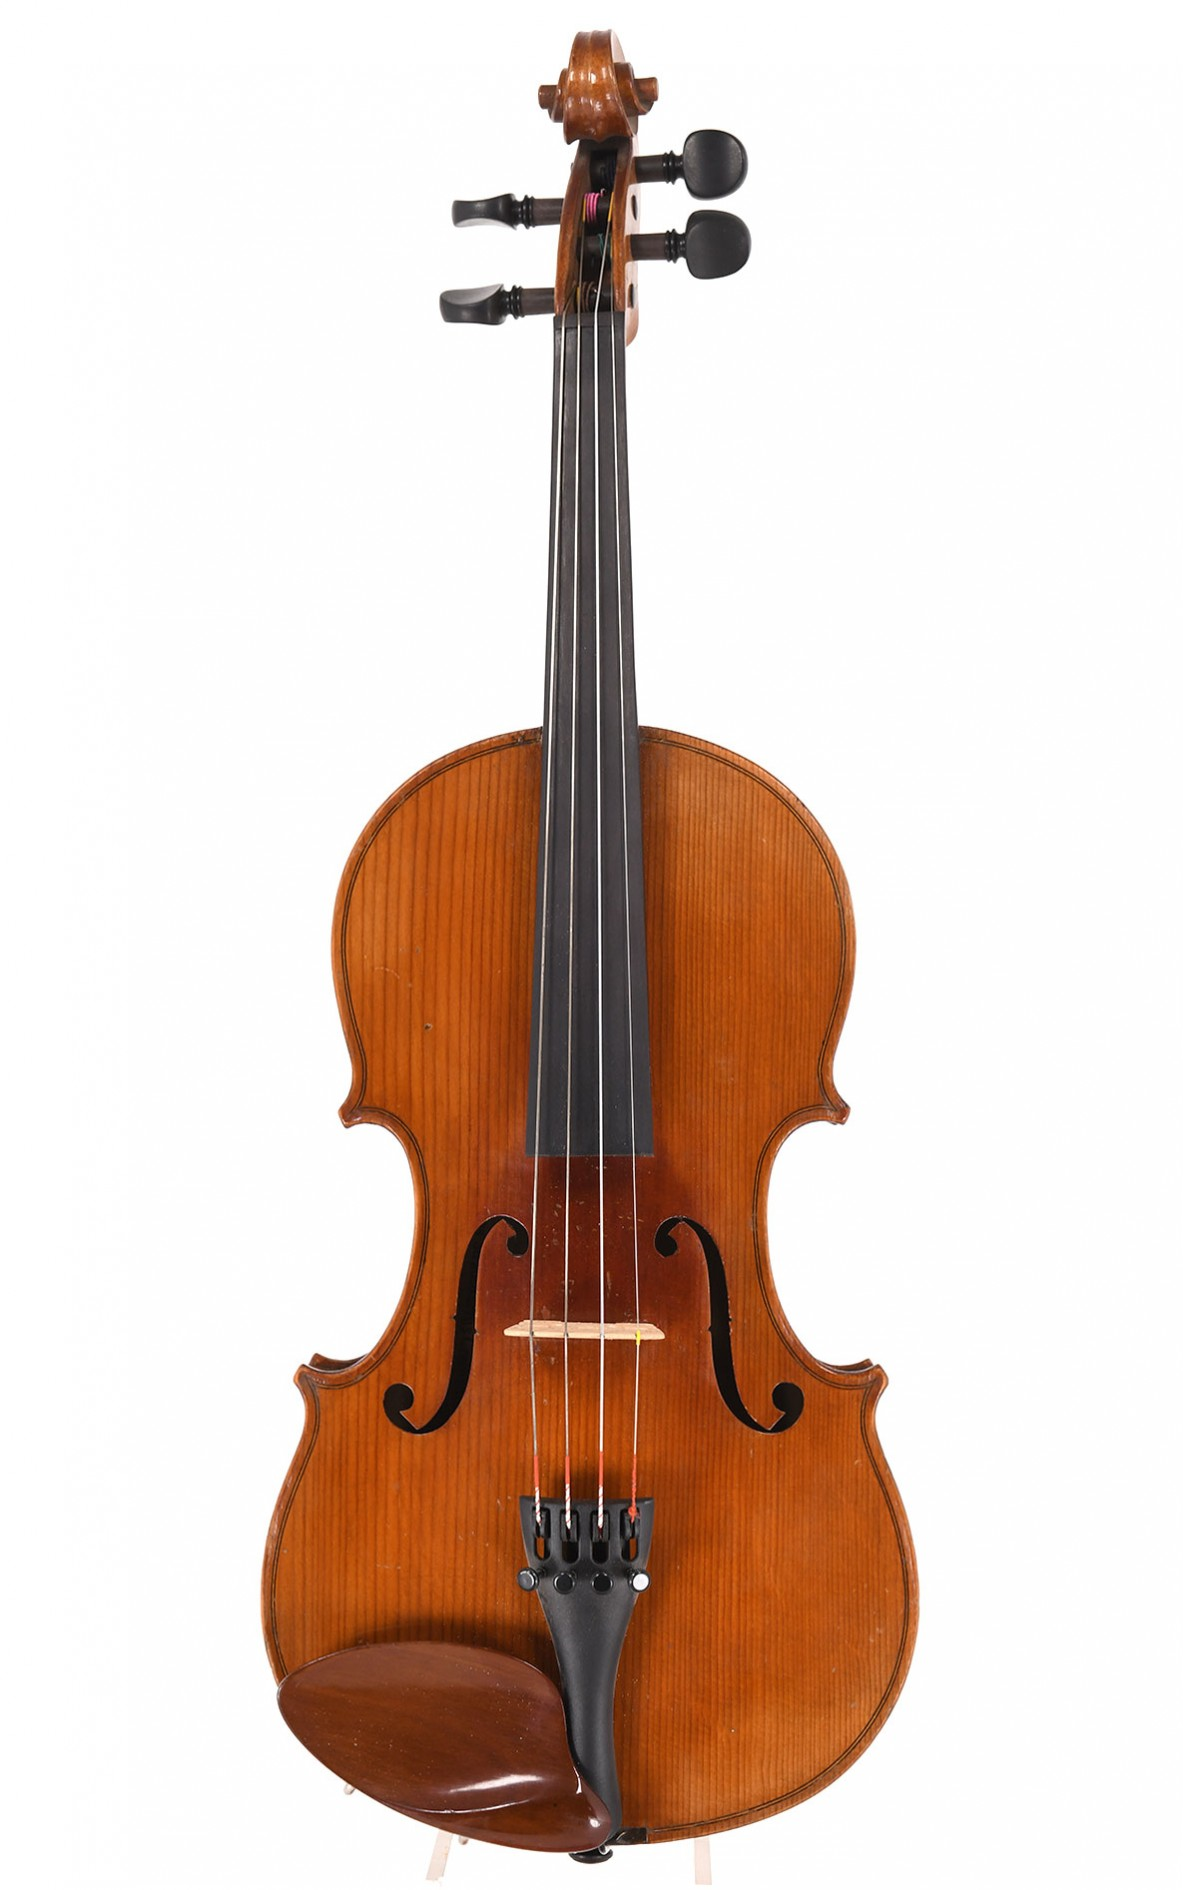 3/4 violin by Jerôme Thibouville-Lamy, around 1910